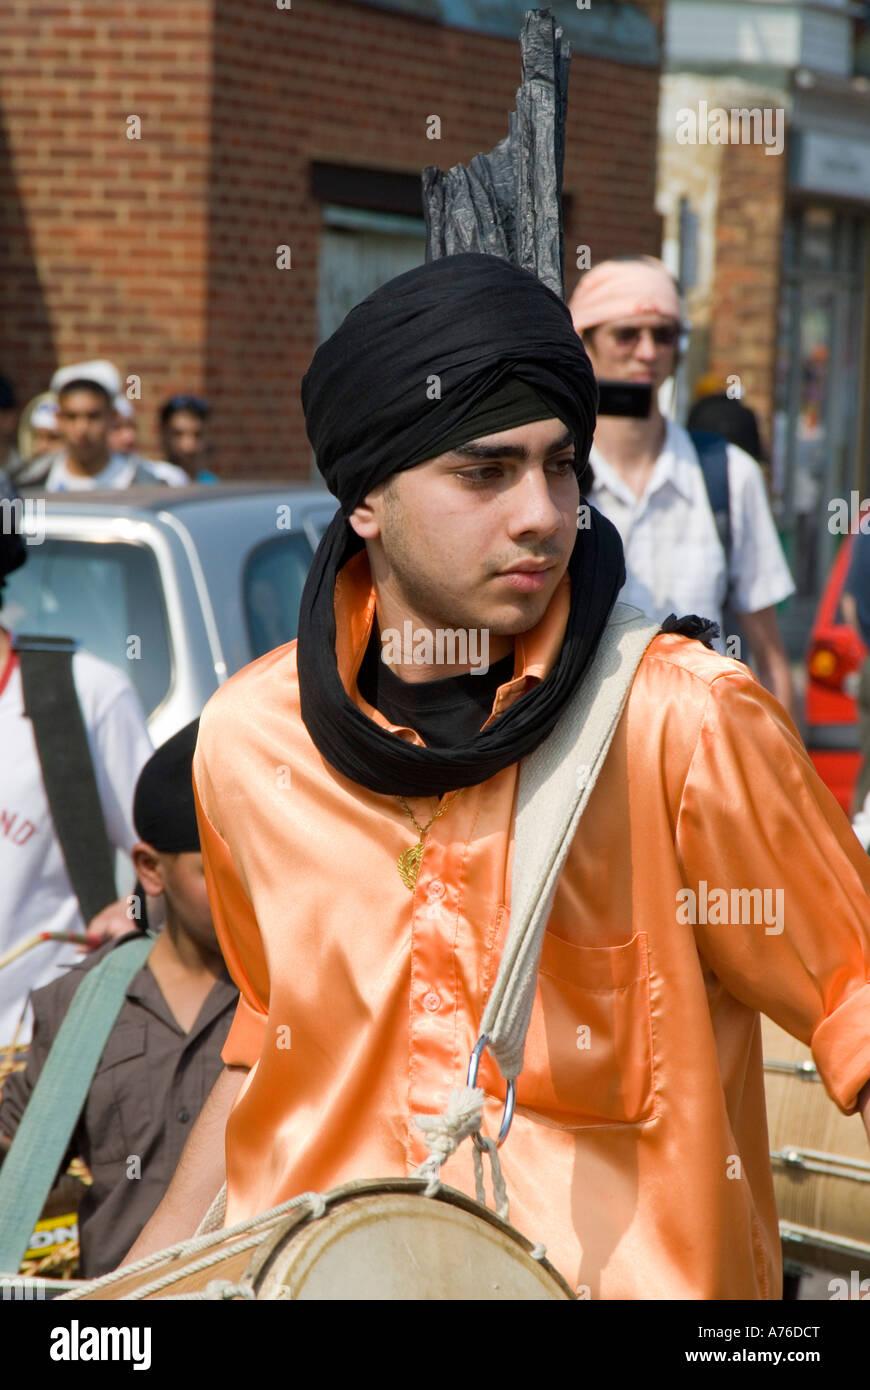 Vaisakhi Celebrazioni in Southampton Inghilterra che ha una grande comunità sikh Immagini Stock